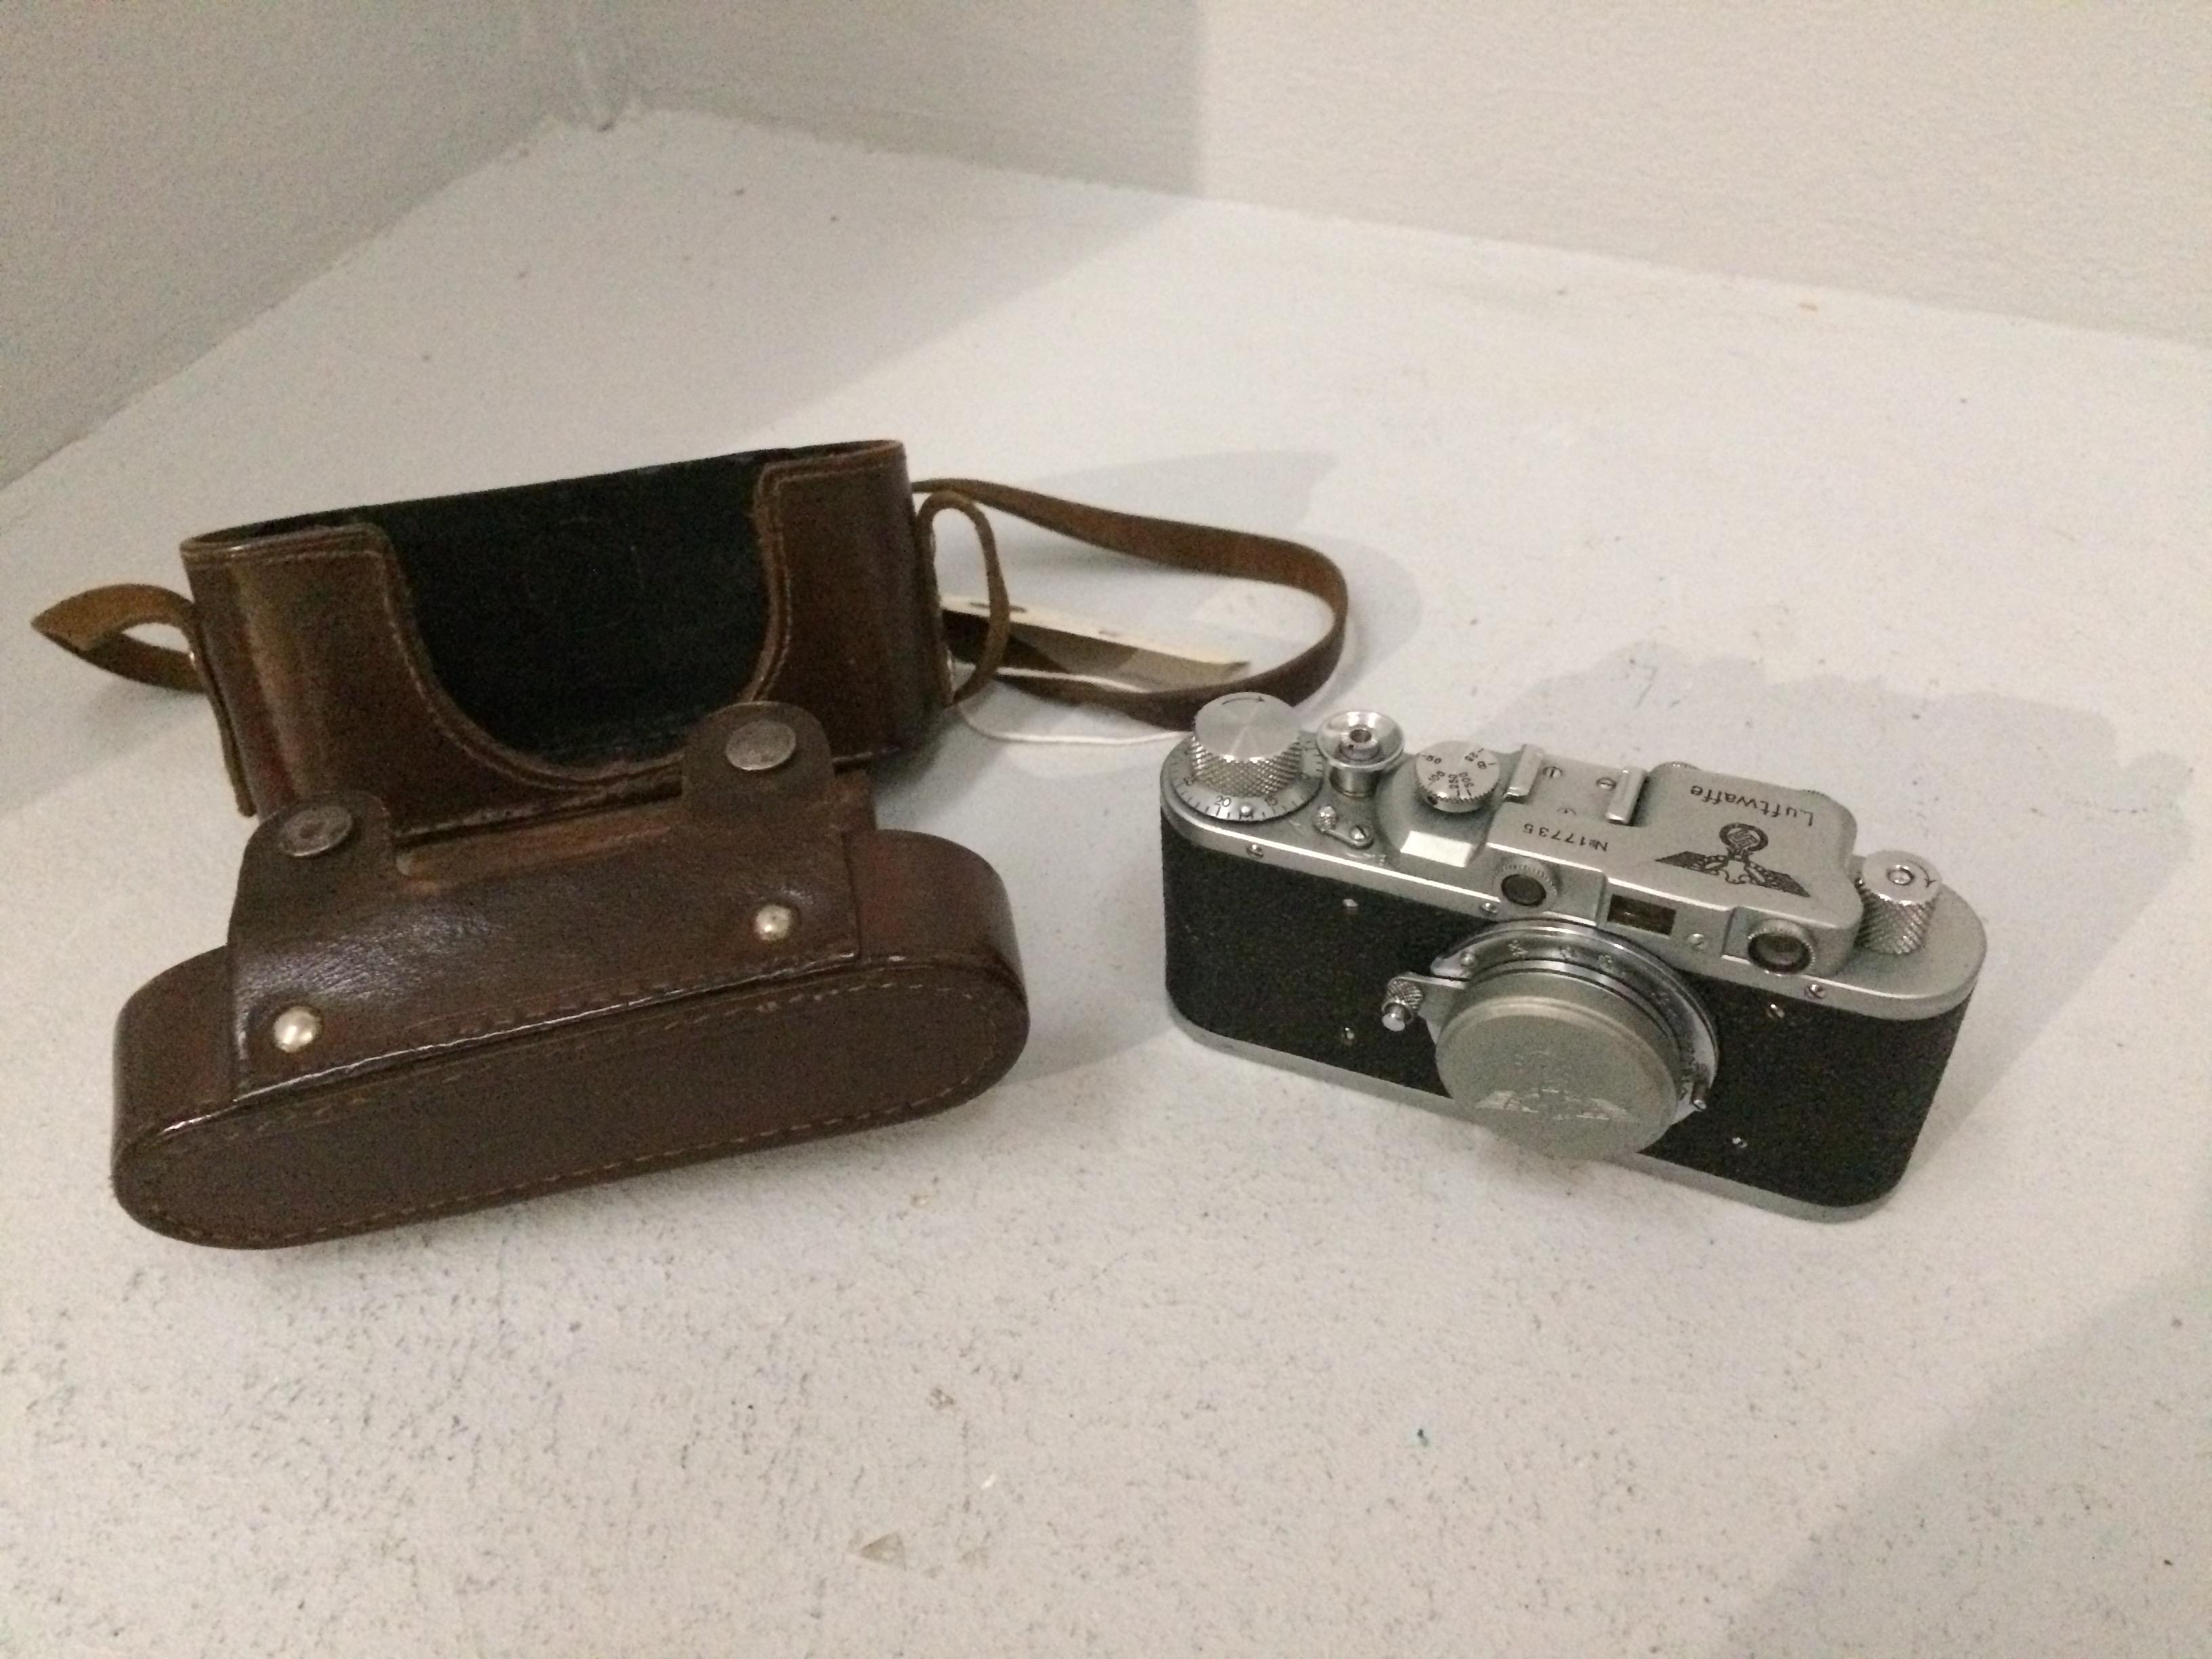 Lot 6 - Luftwaffe no. 17735 camera with Leitz Elmar 1..